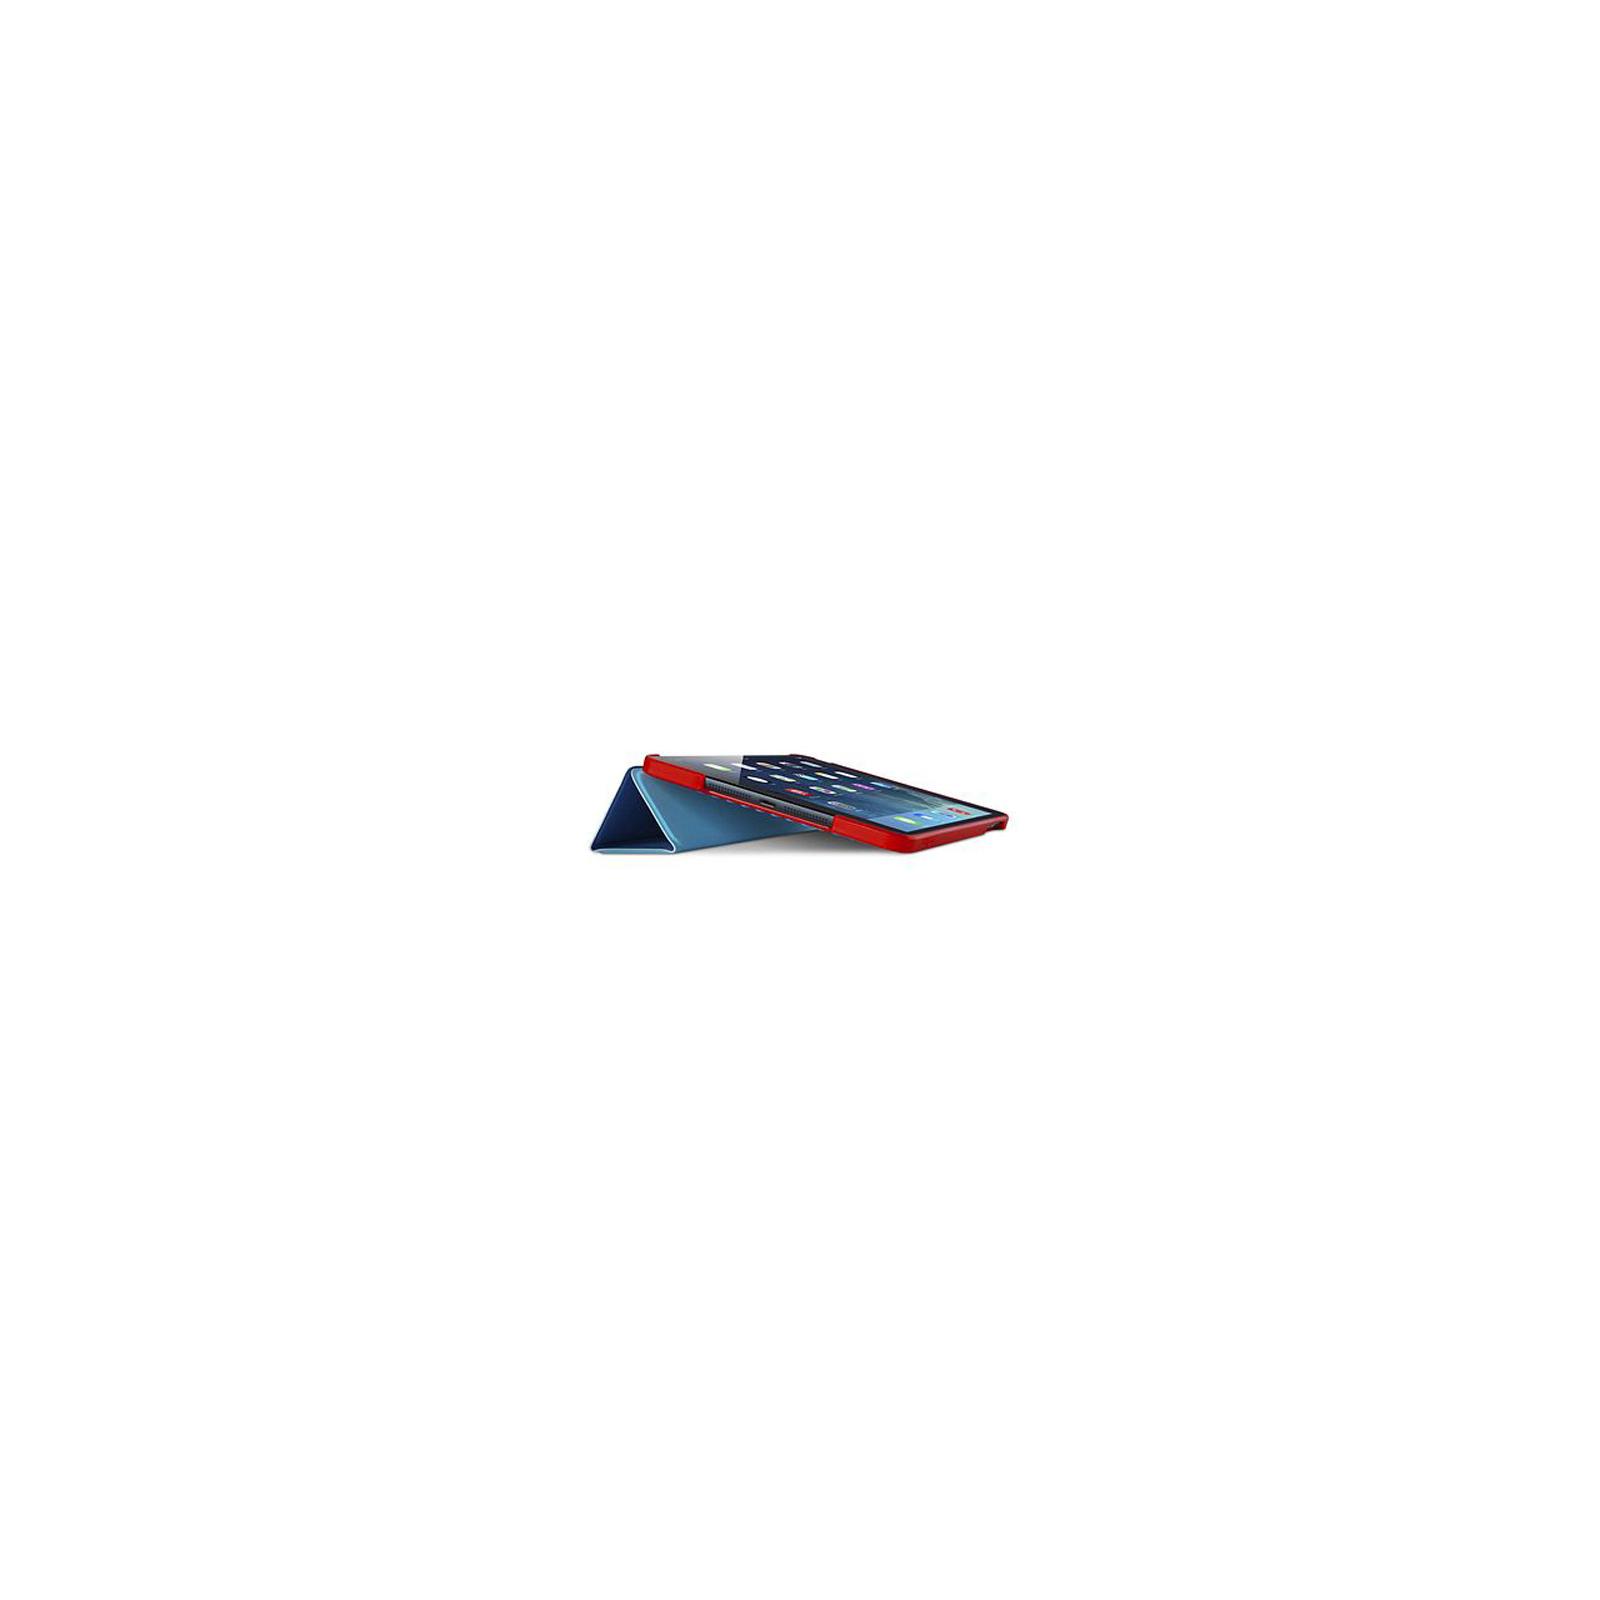 Чехол для планшета Belkin iPad mini LEGO Builder Case Red-Blue (F7N110B2C02) изображение 6